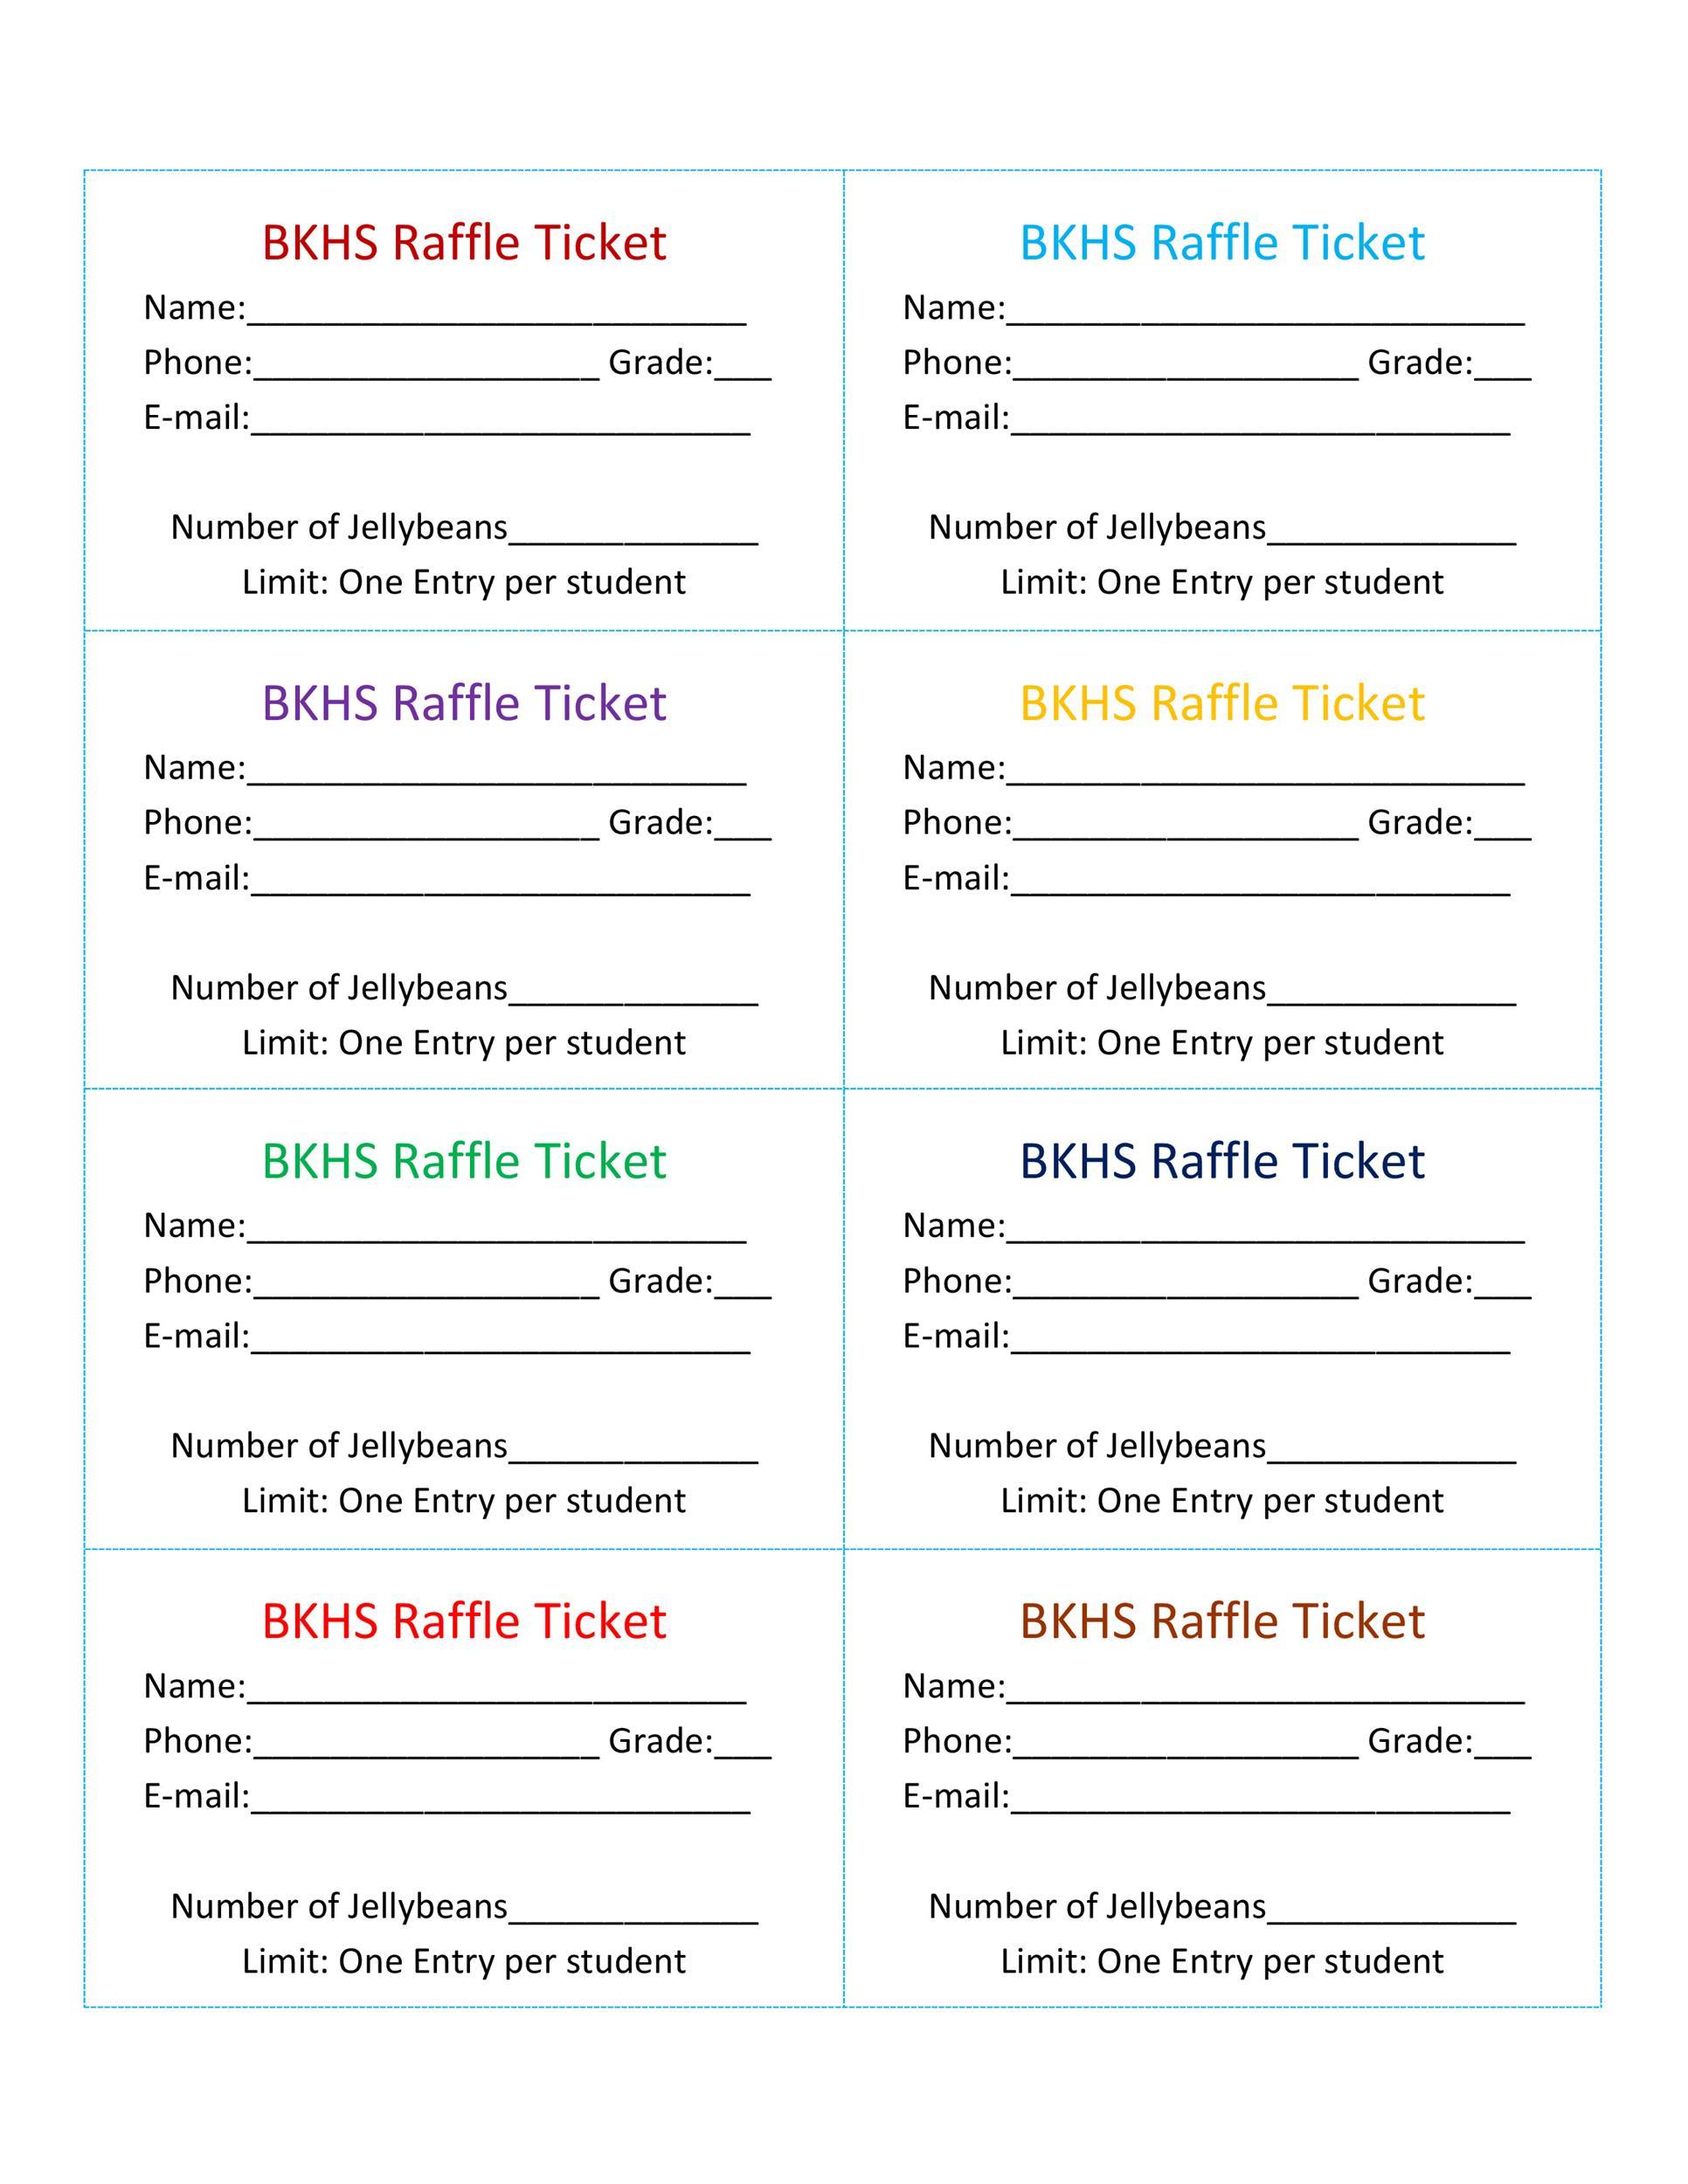 Free Raffle Ticket Templates 13